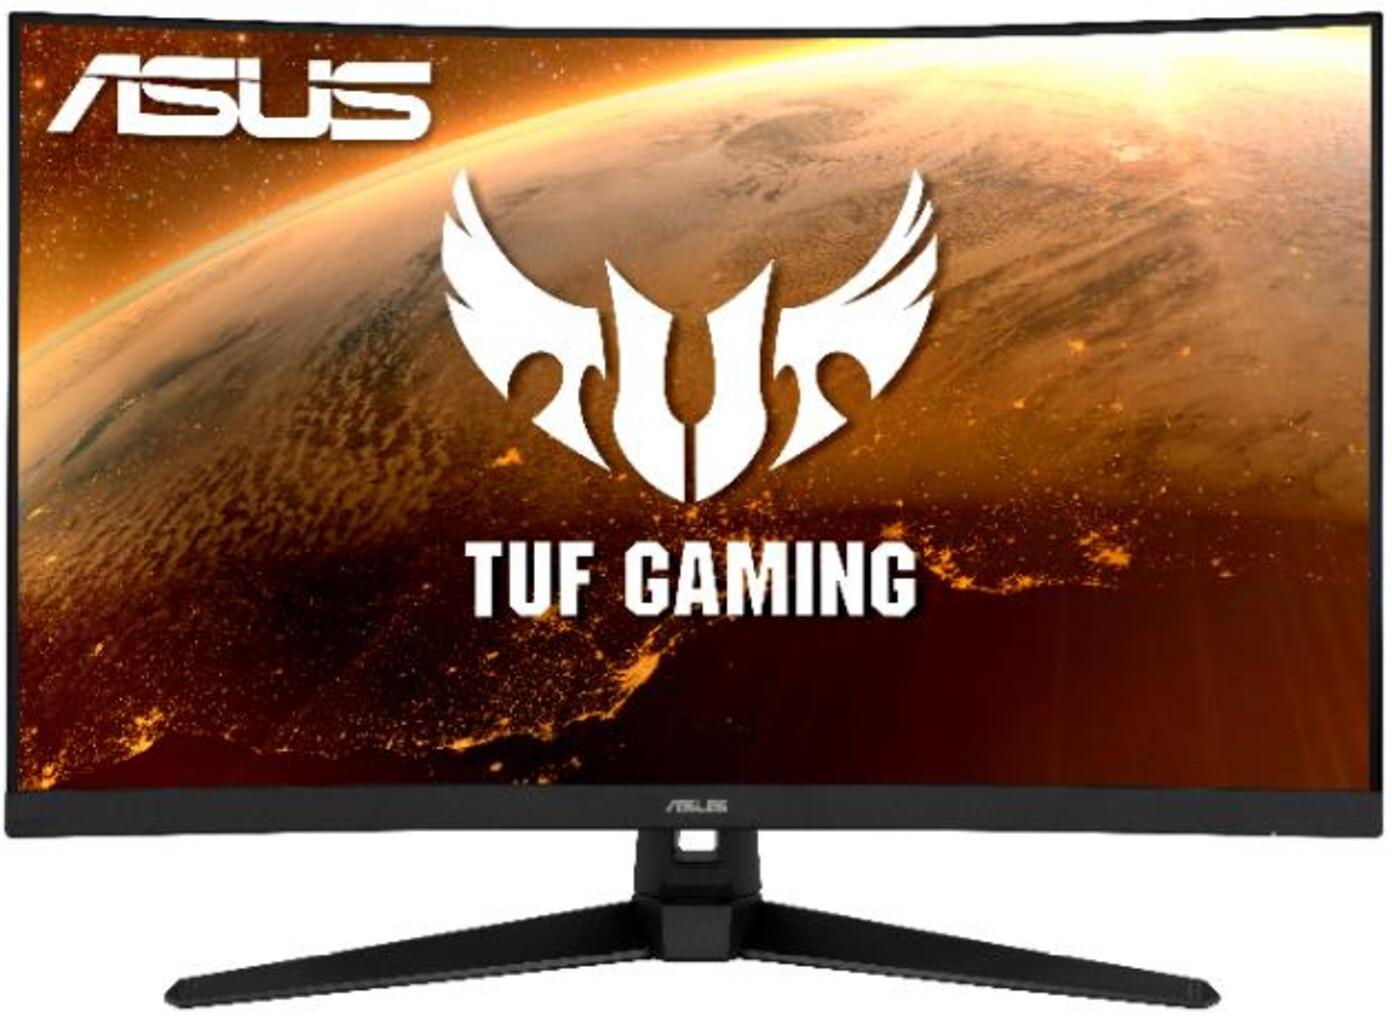 "ASUS TUF VG27WQ1B 27"" WQHD Curved Gaming Monitor (1 ms, 165 Hz, HDR10, 2x HDMI, 1x DP, VA, Free/Adaptive Sync) für 289,66€ (Saturn)"